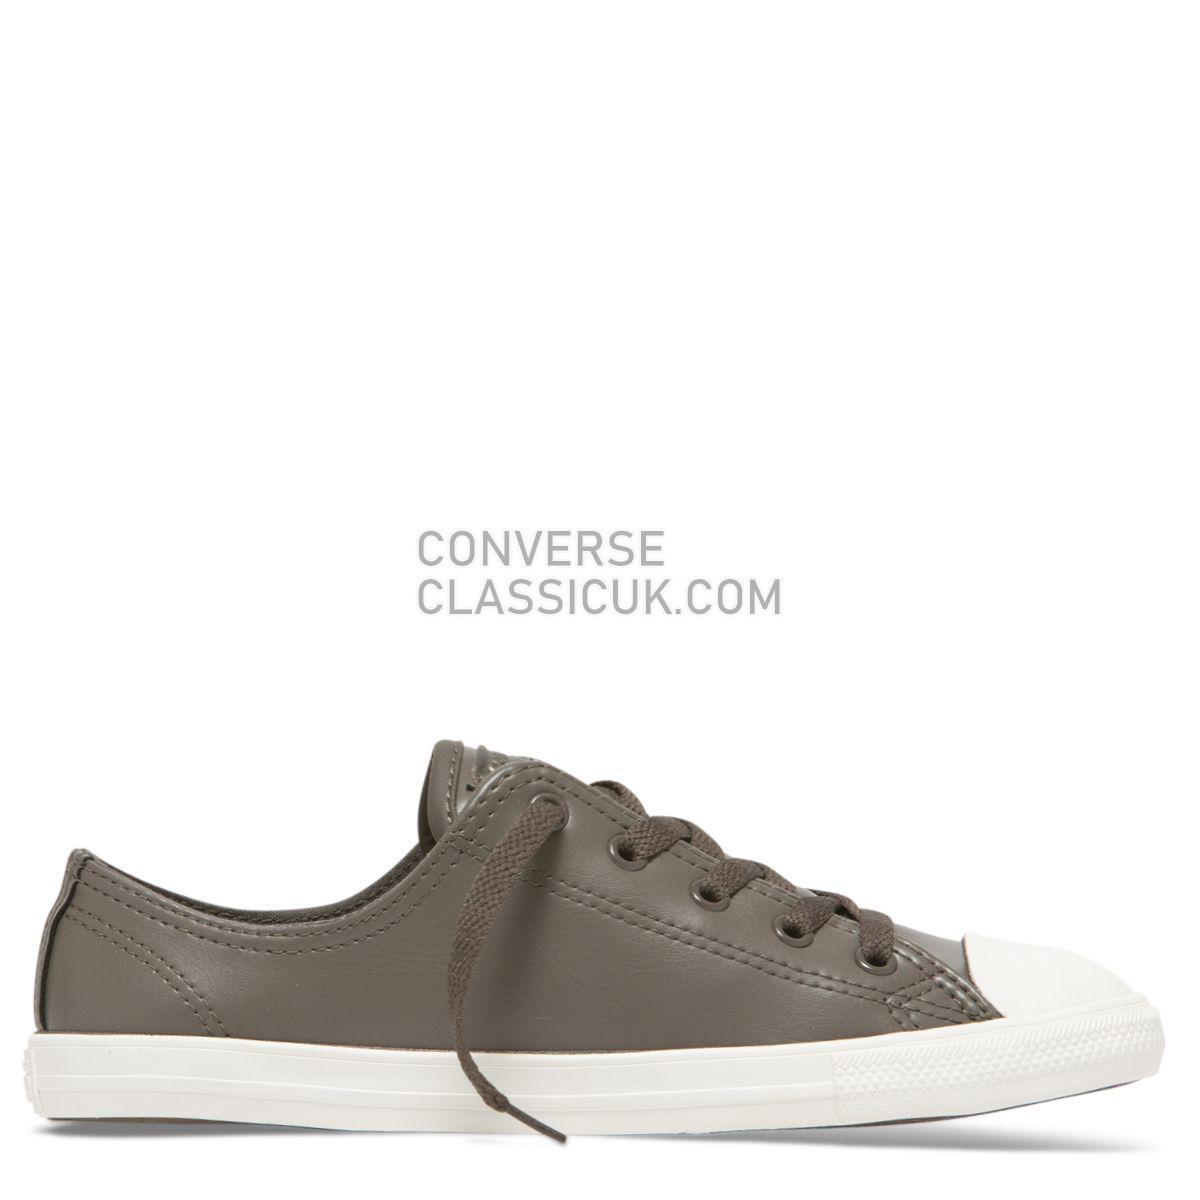 Converse Chuck Taylor All Star Dainty Craft Low Top Ridgerock Womens 564428 Ridgerock/Ridgerock/Vintage White Shoes